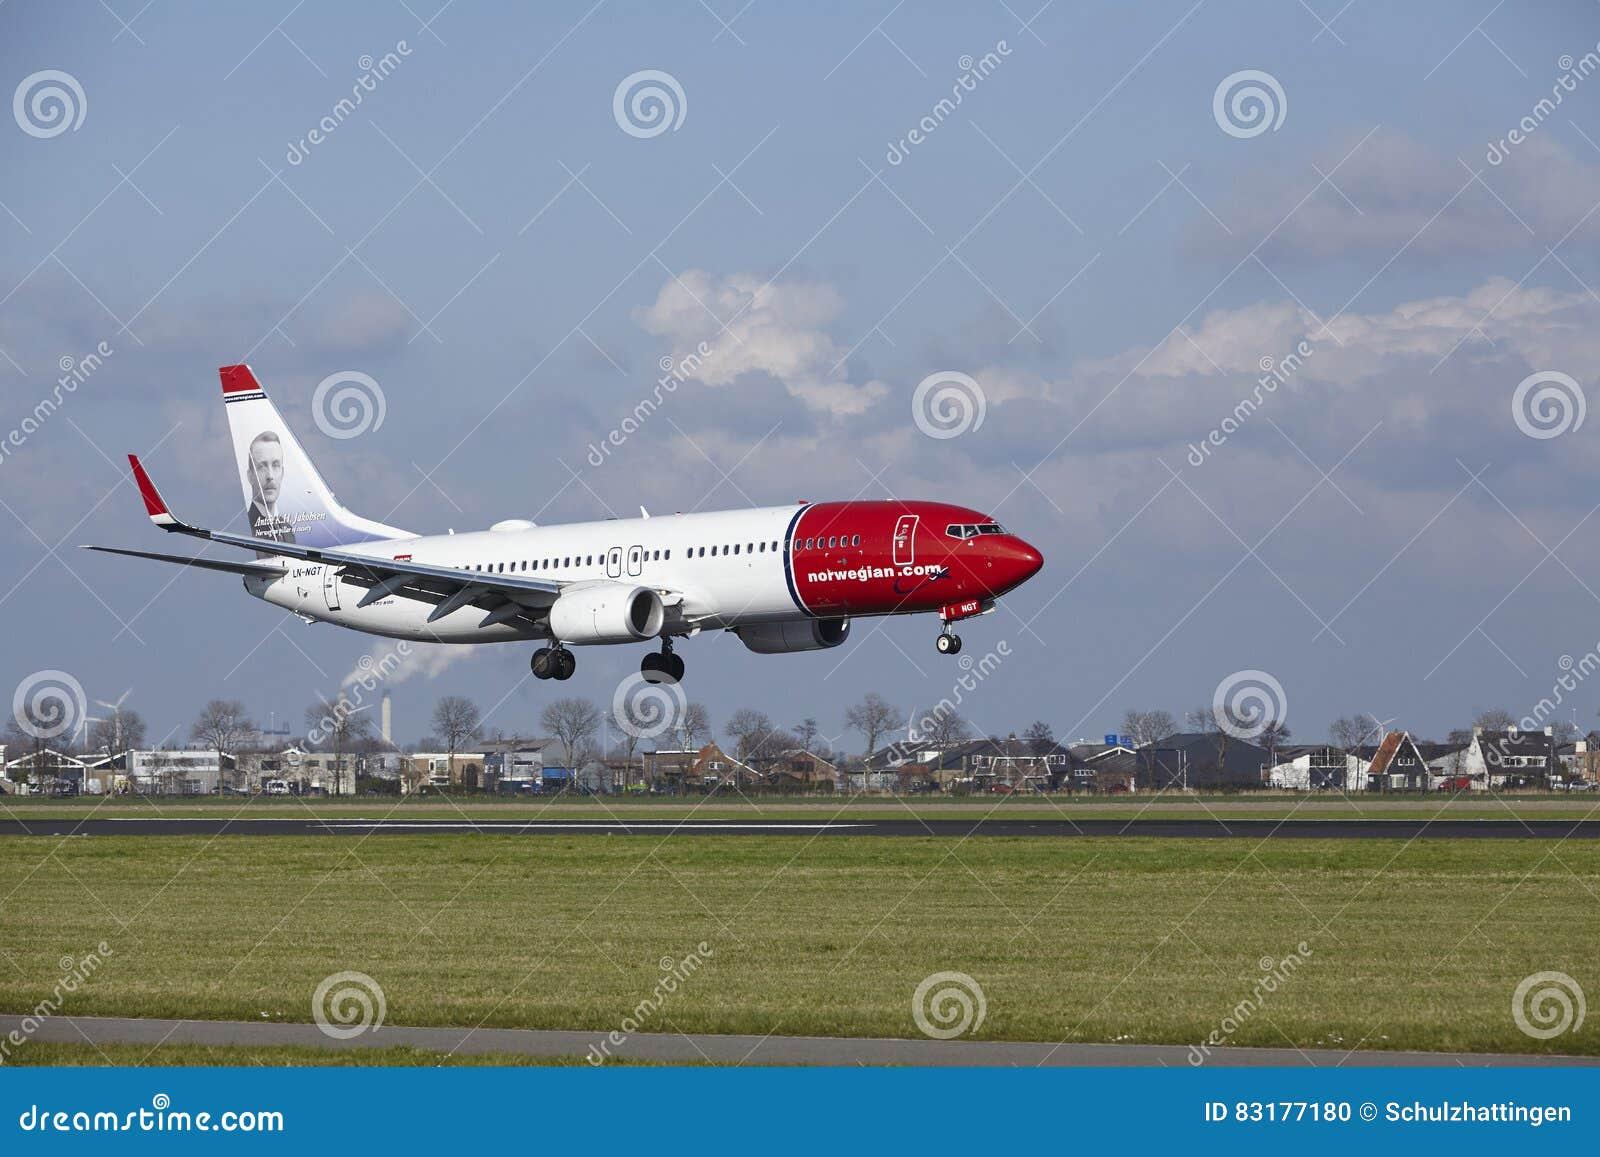 Amsterdam Airport Schiphol - Norwegian Airlines Boeing 737